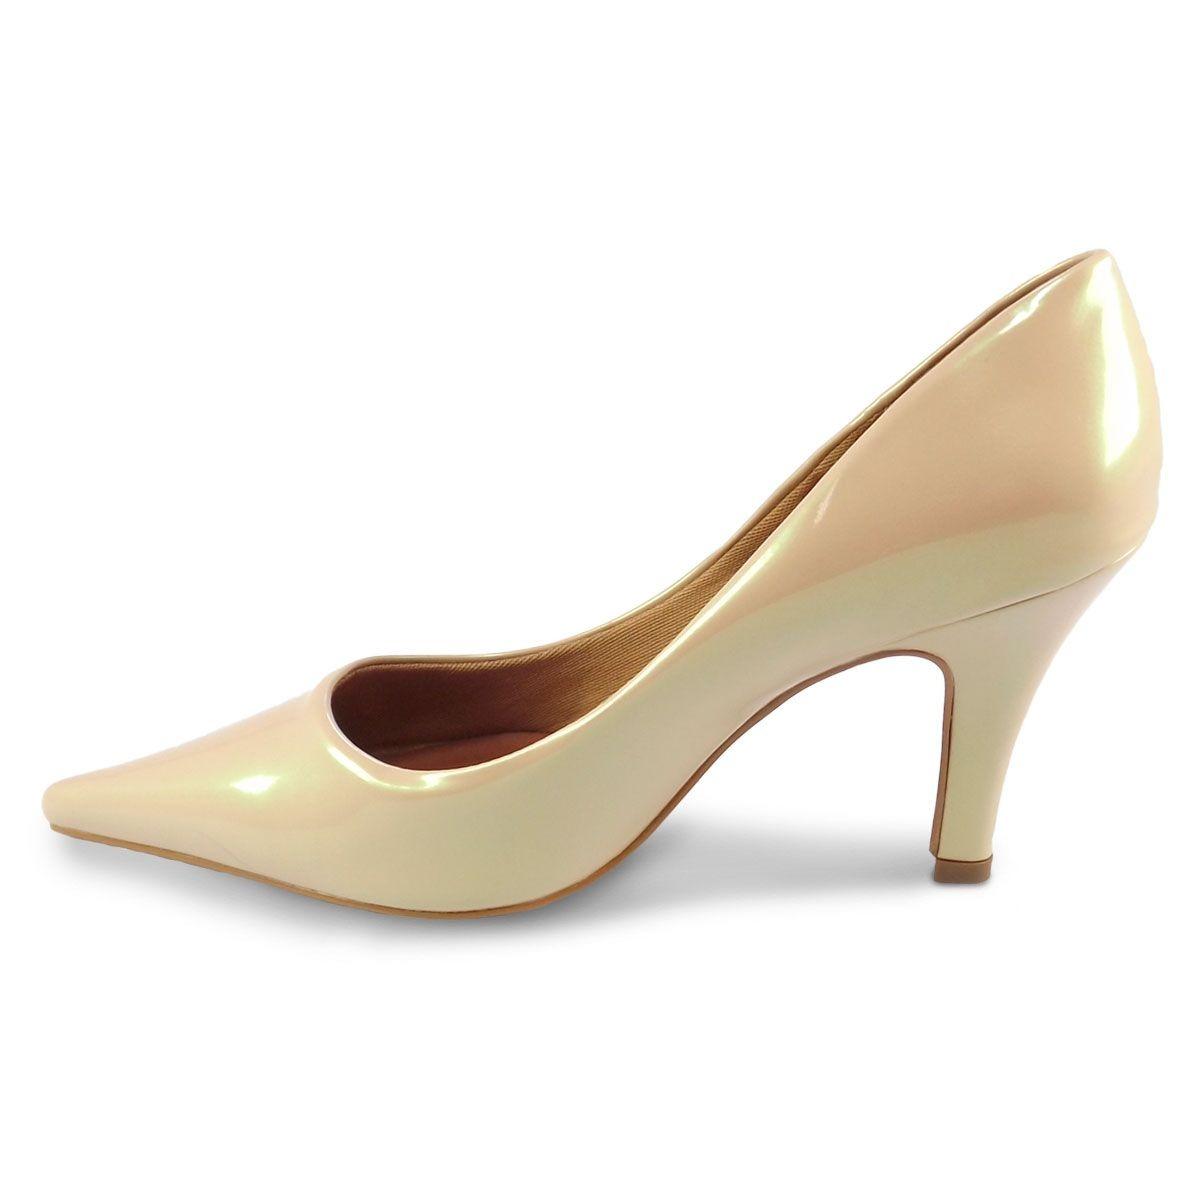 342de8876d sapato scarpin salto fino branco noiva casamento festa. Carregando zoom.